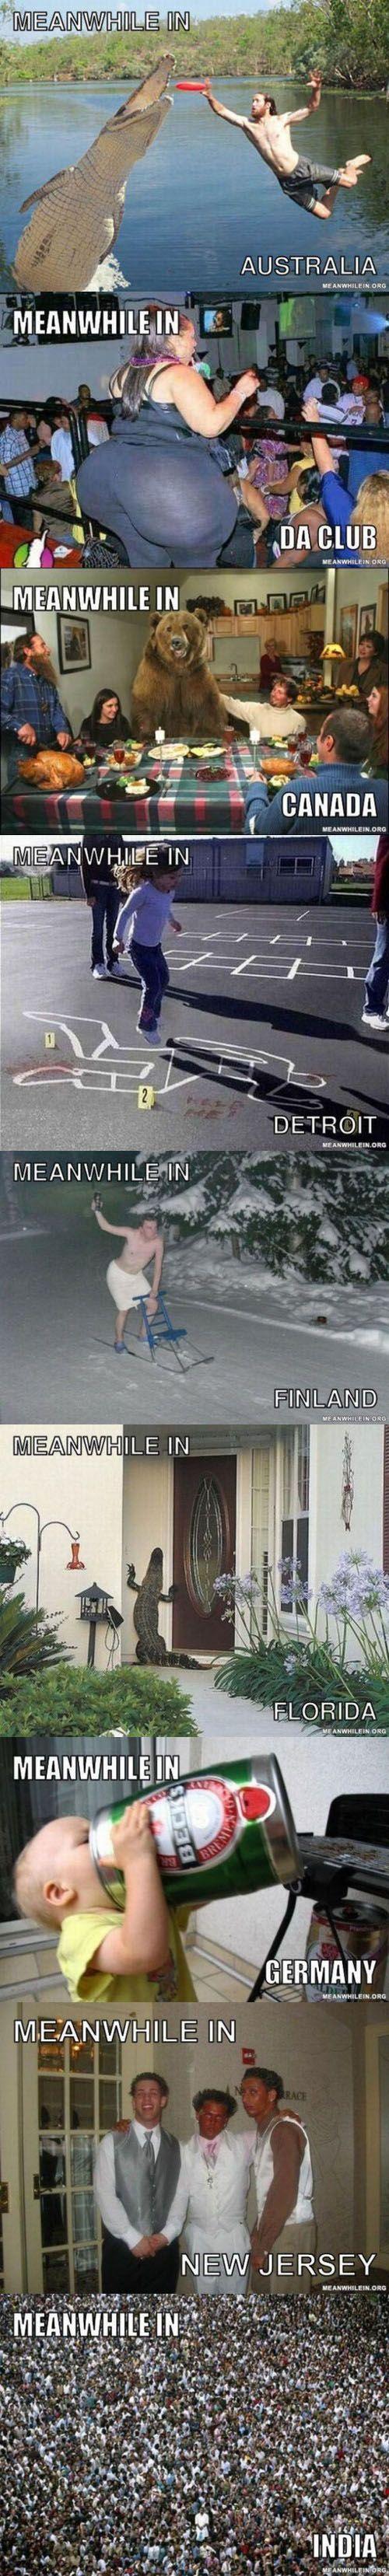 Hahaha, the Finnish activity definitely looks familiar!